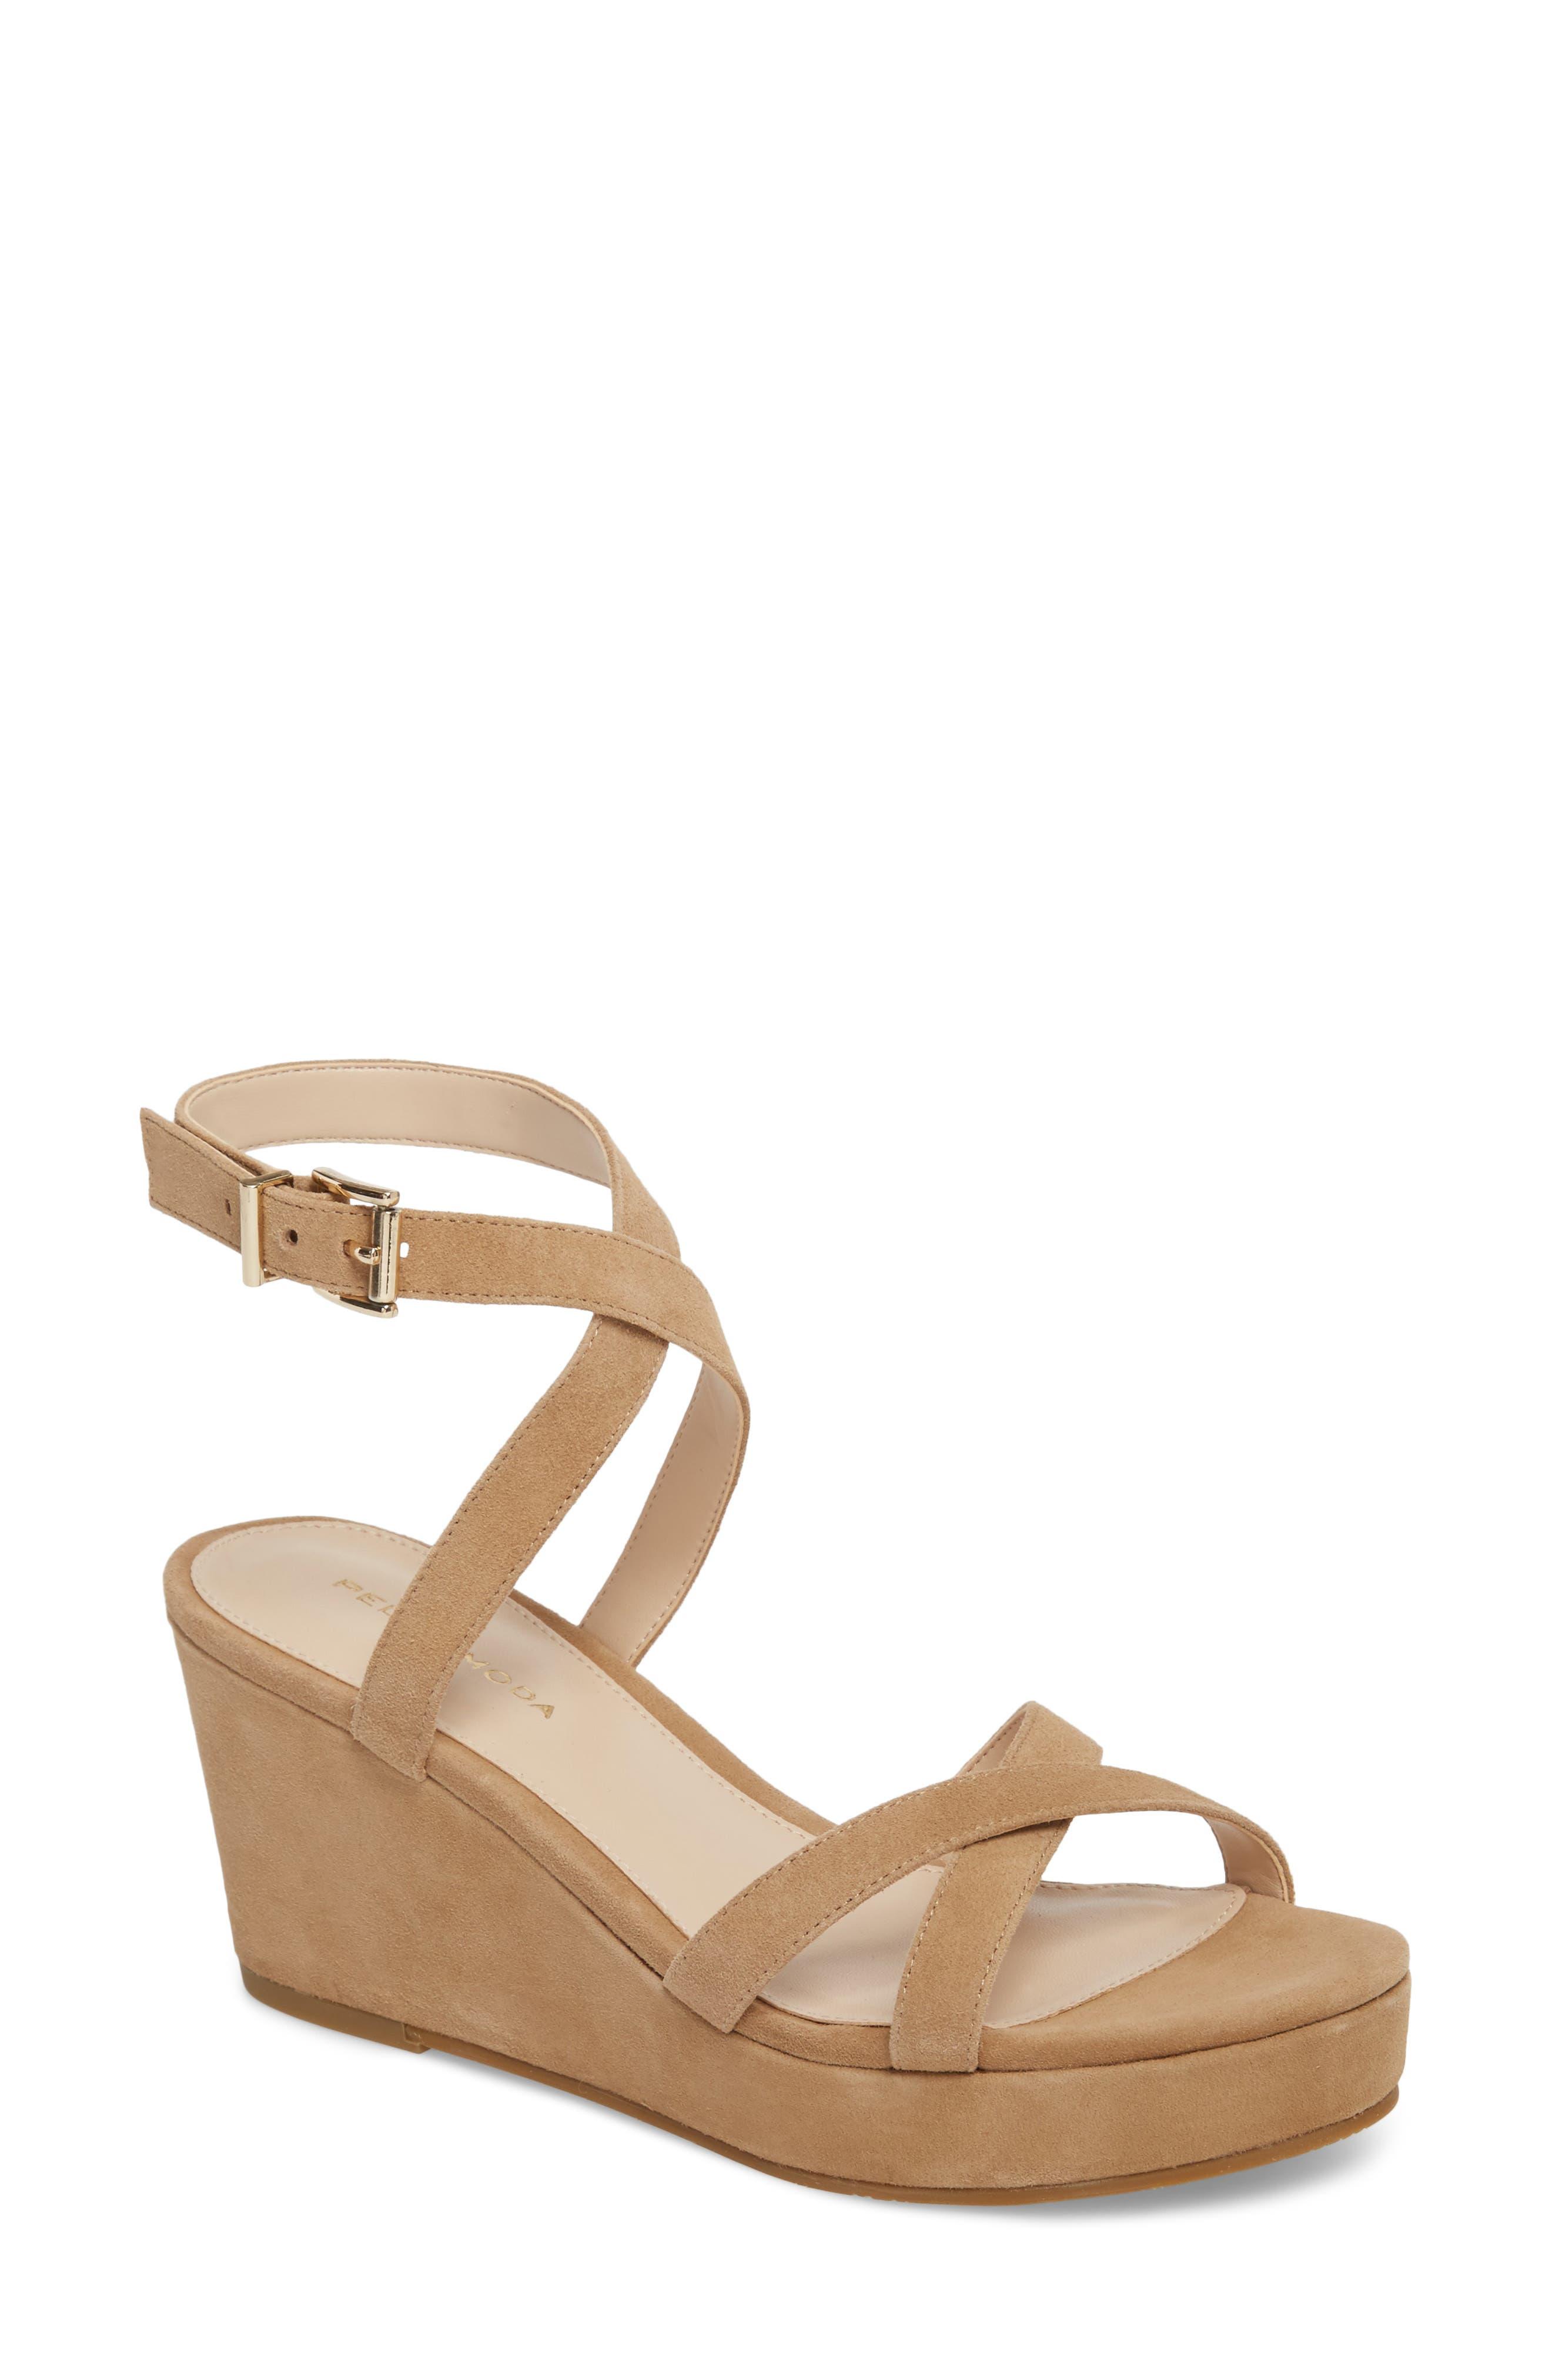 Main Image - Pelle Moda Keo2 Platform Wedge Sandal (Women)